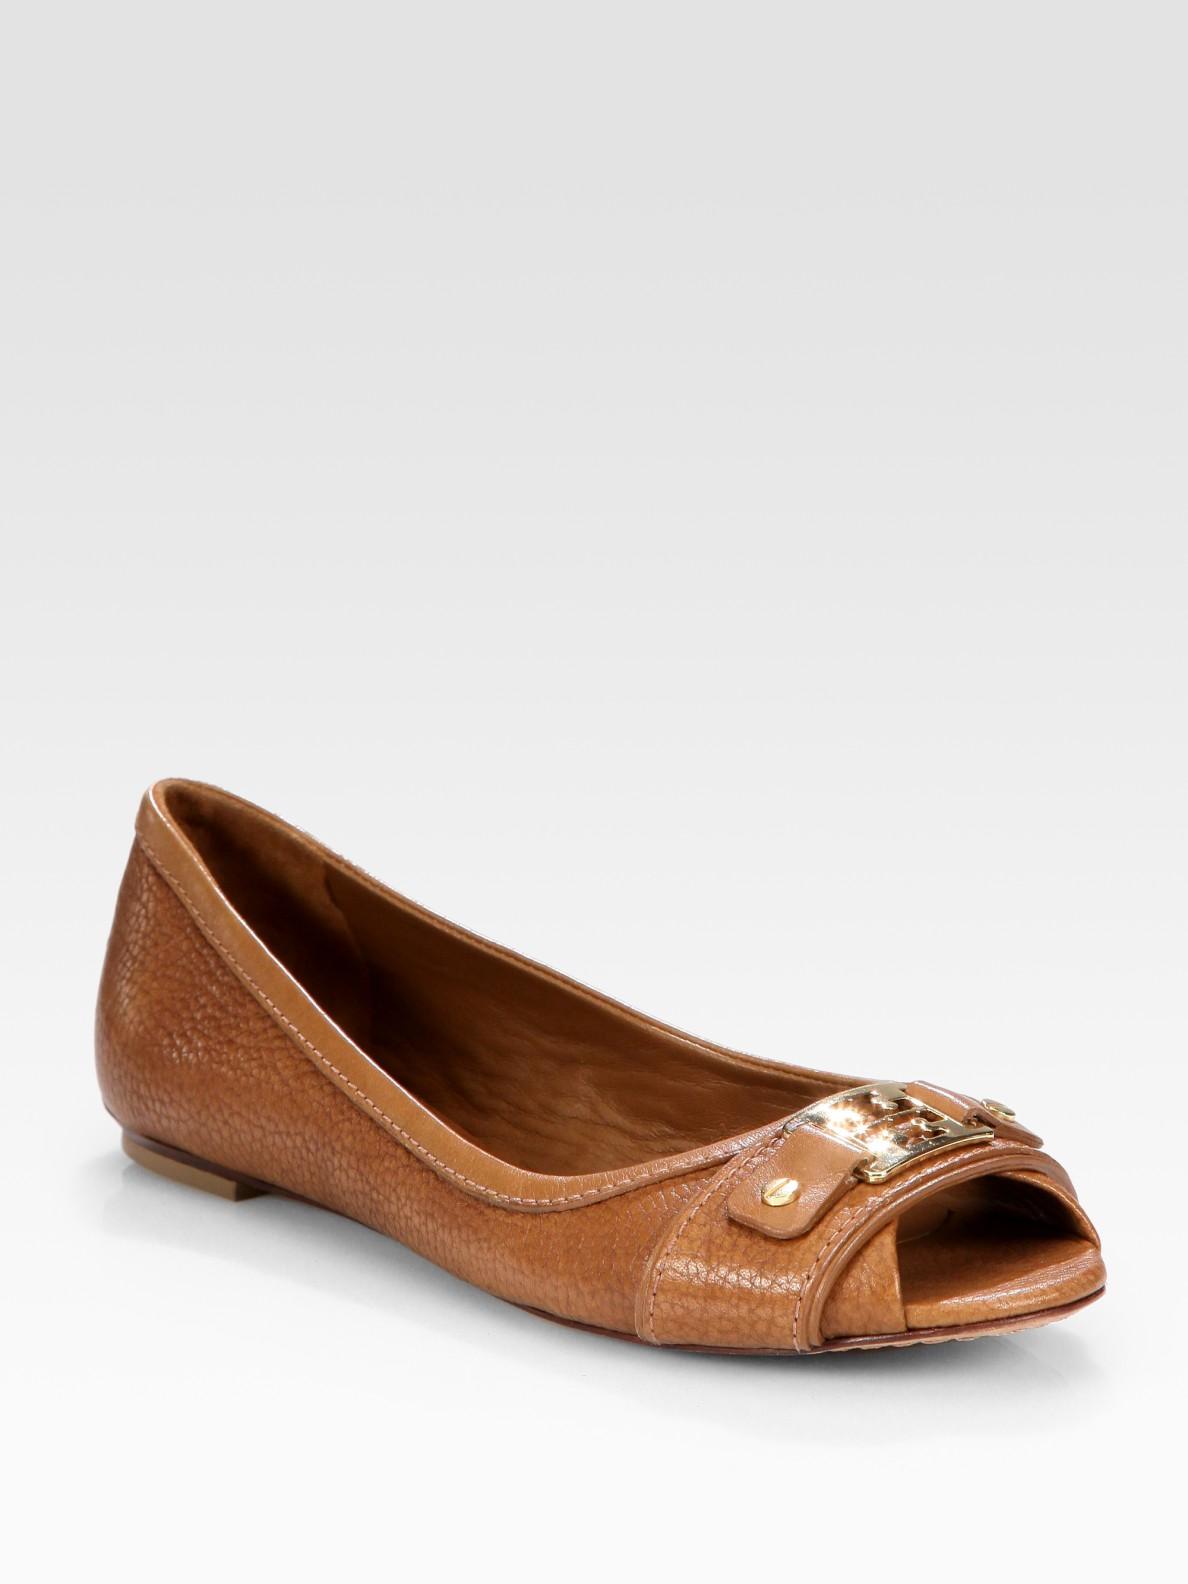 Tory Burch Leather Peep-Toe Flats outlet popular 3l8KSAEnc